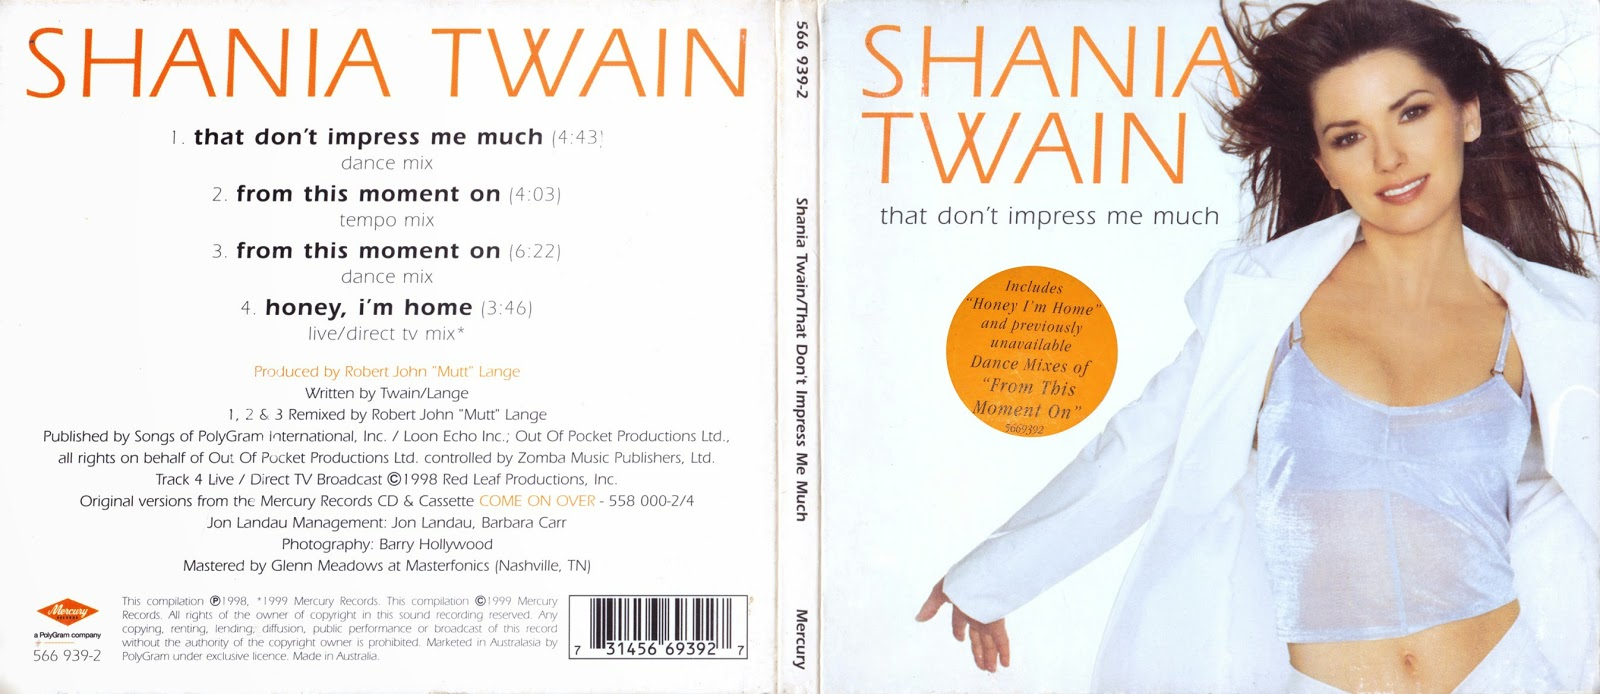 shania twain discography blogspot